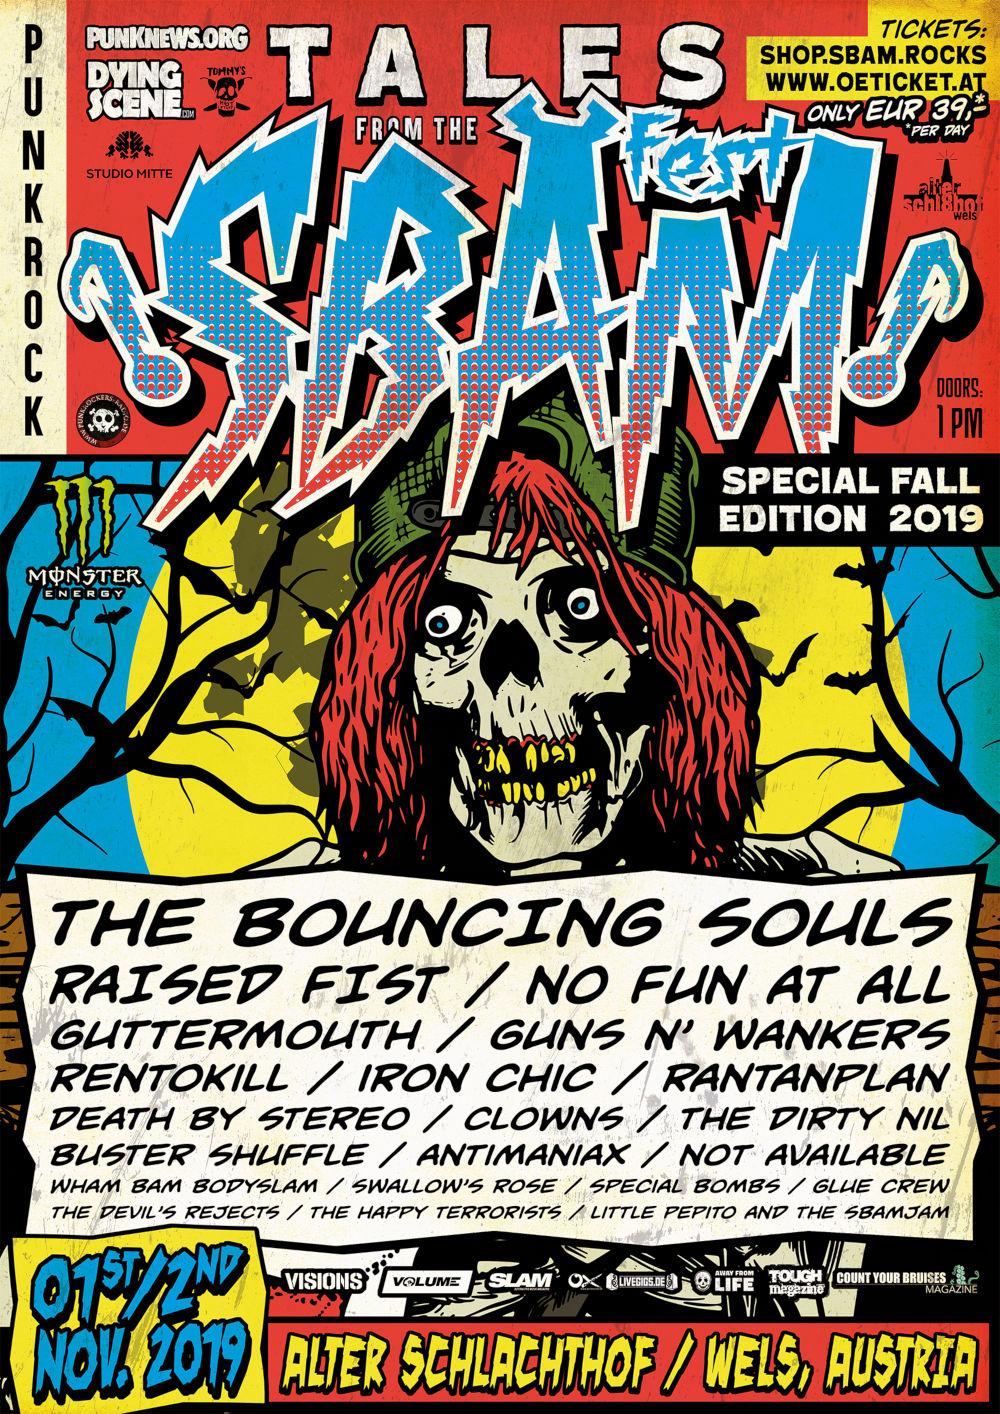 SBÄM Fest - Fall Edition 2019